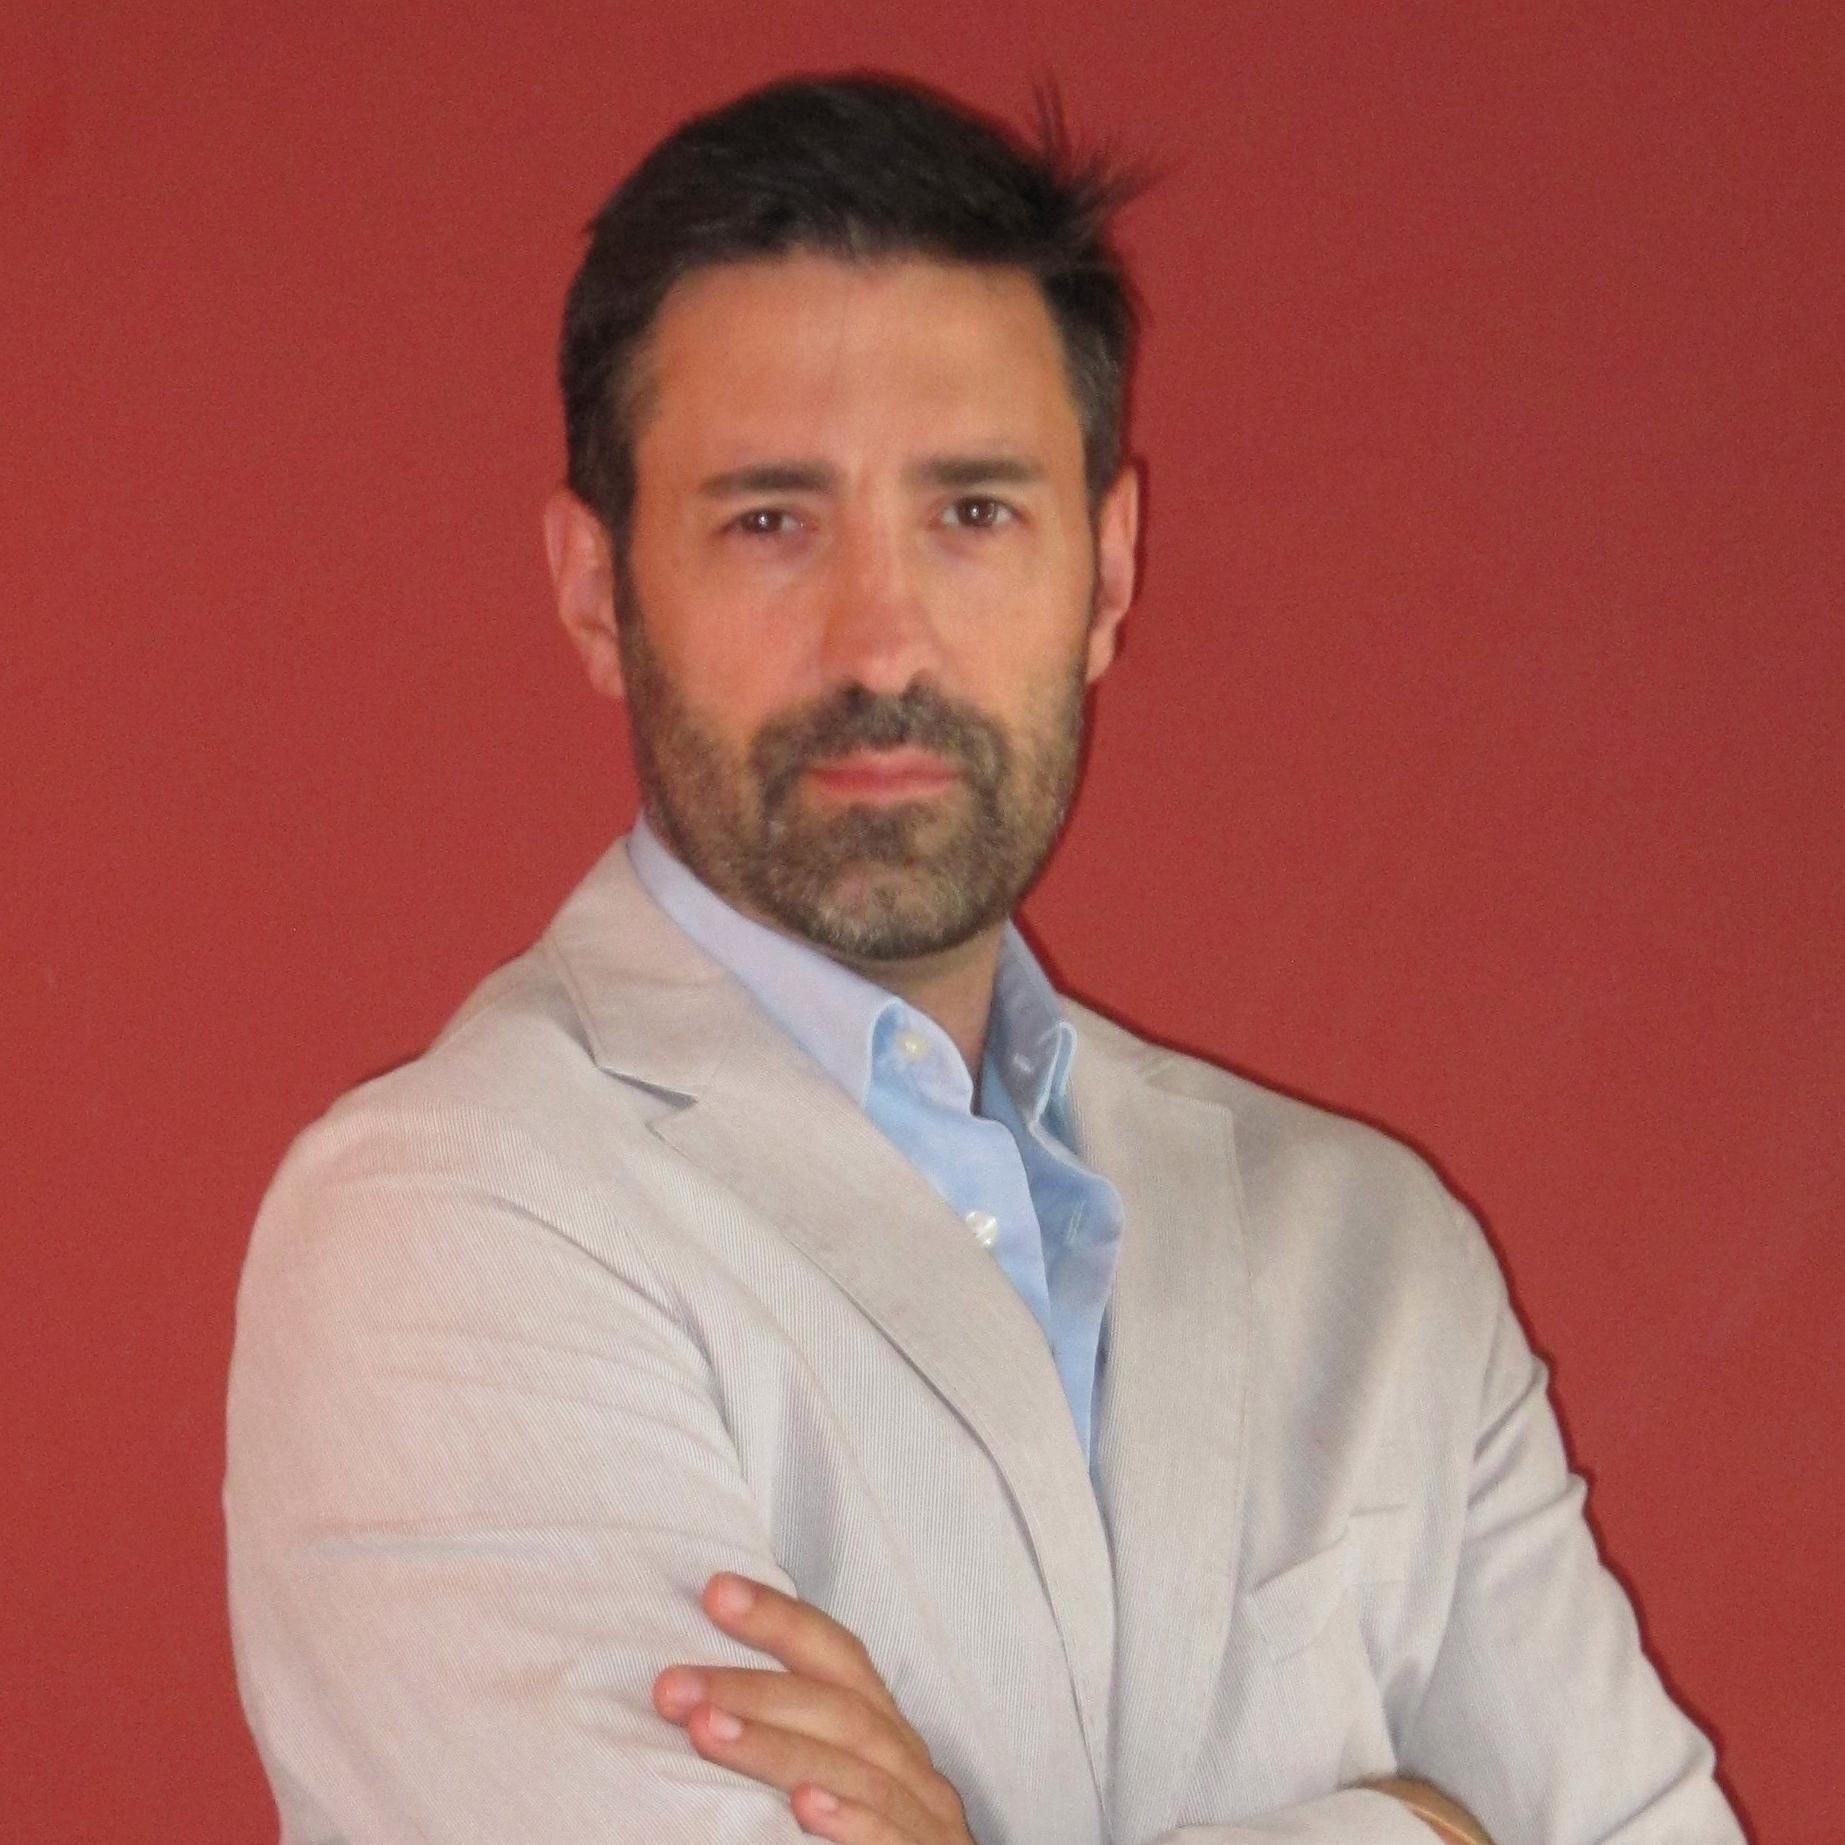 Chris Nunes